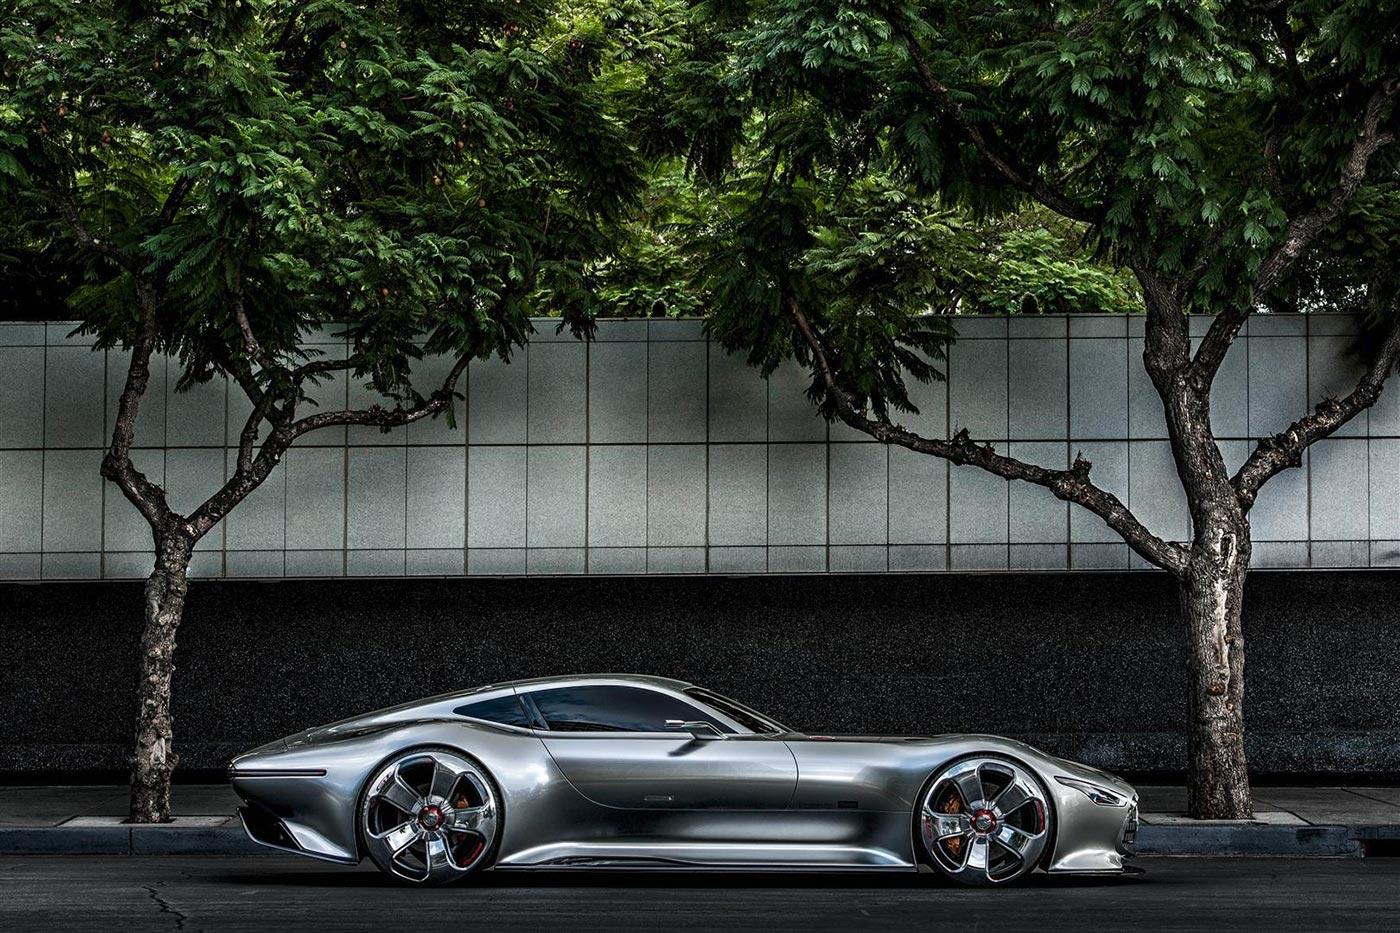 Mercedes-Benz presents AMG Vision Gran Turismo 2